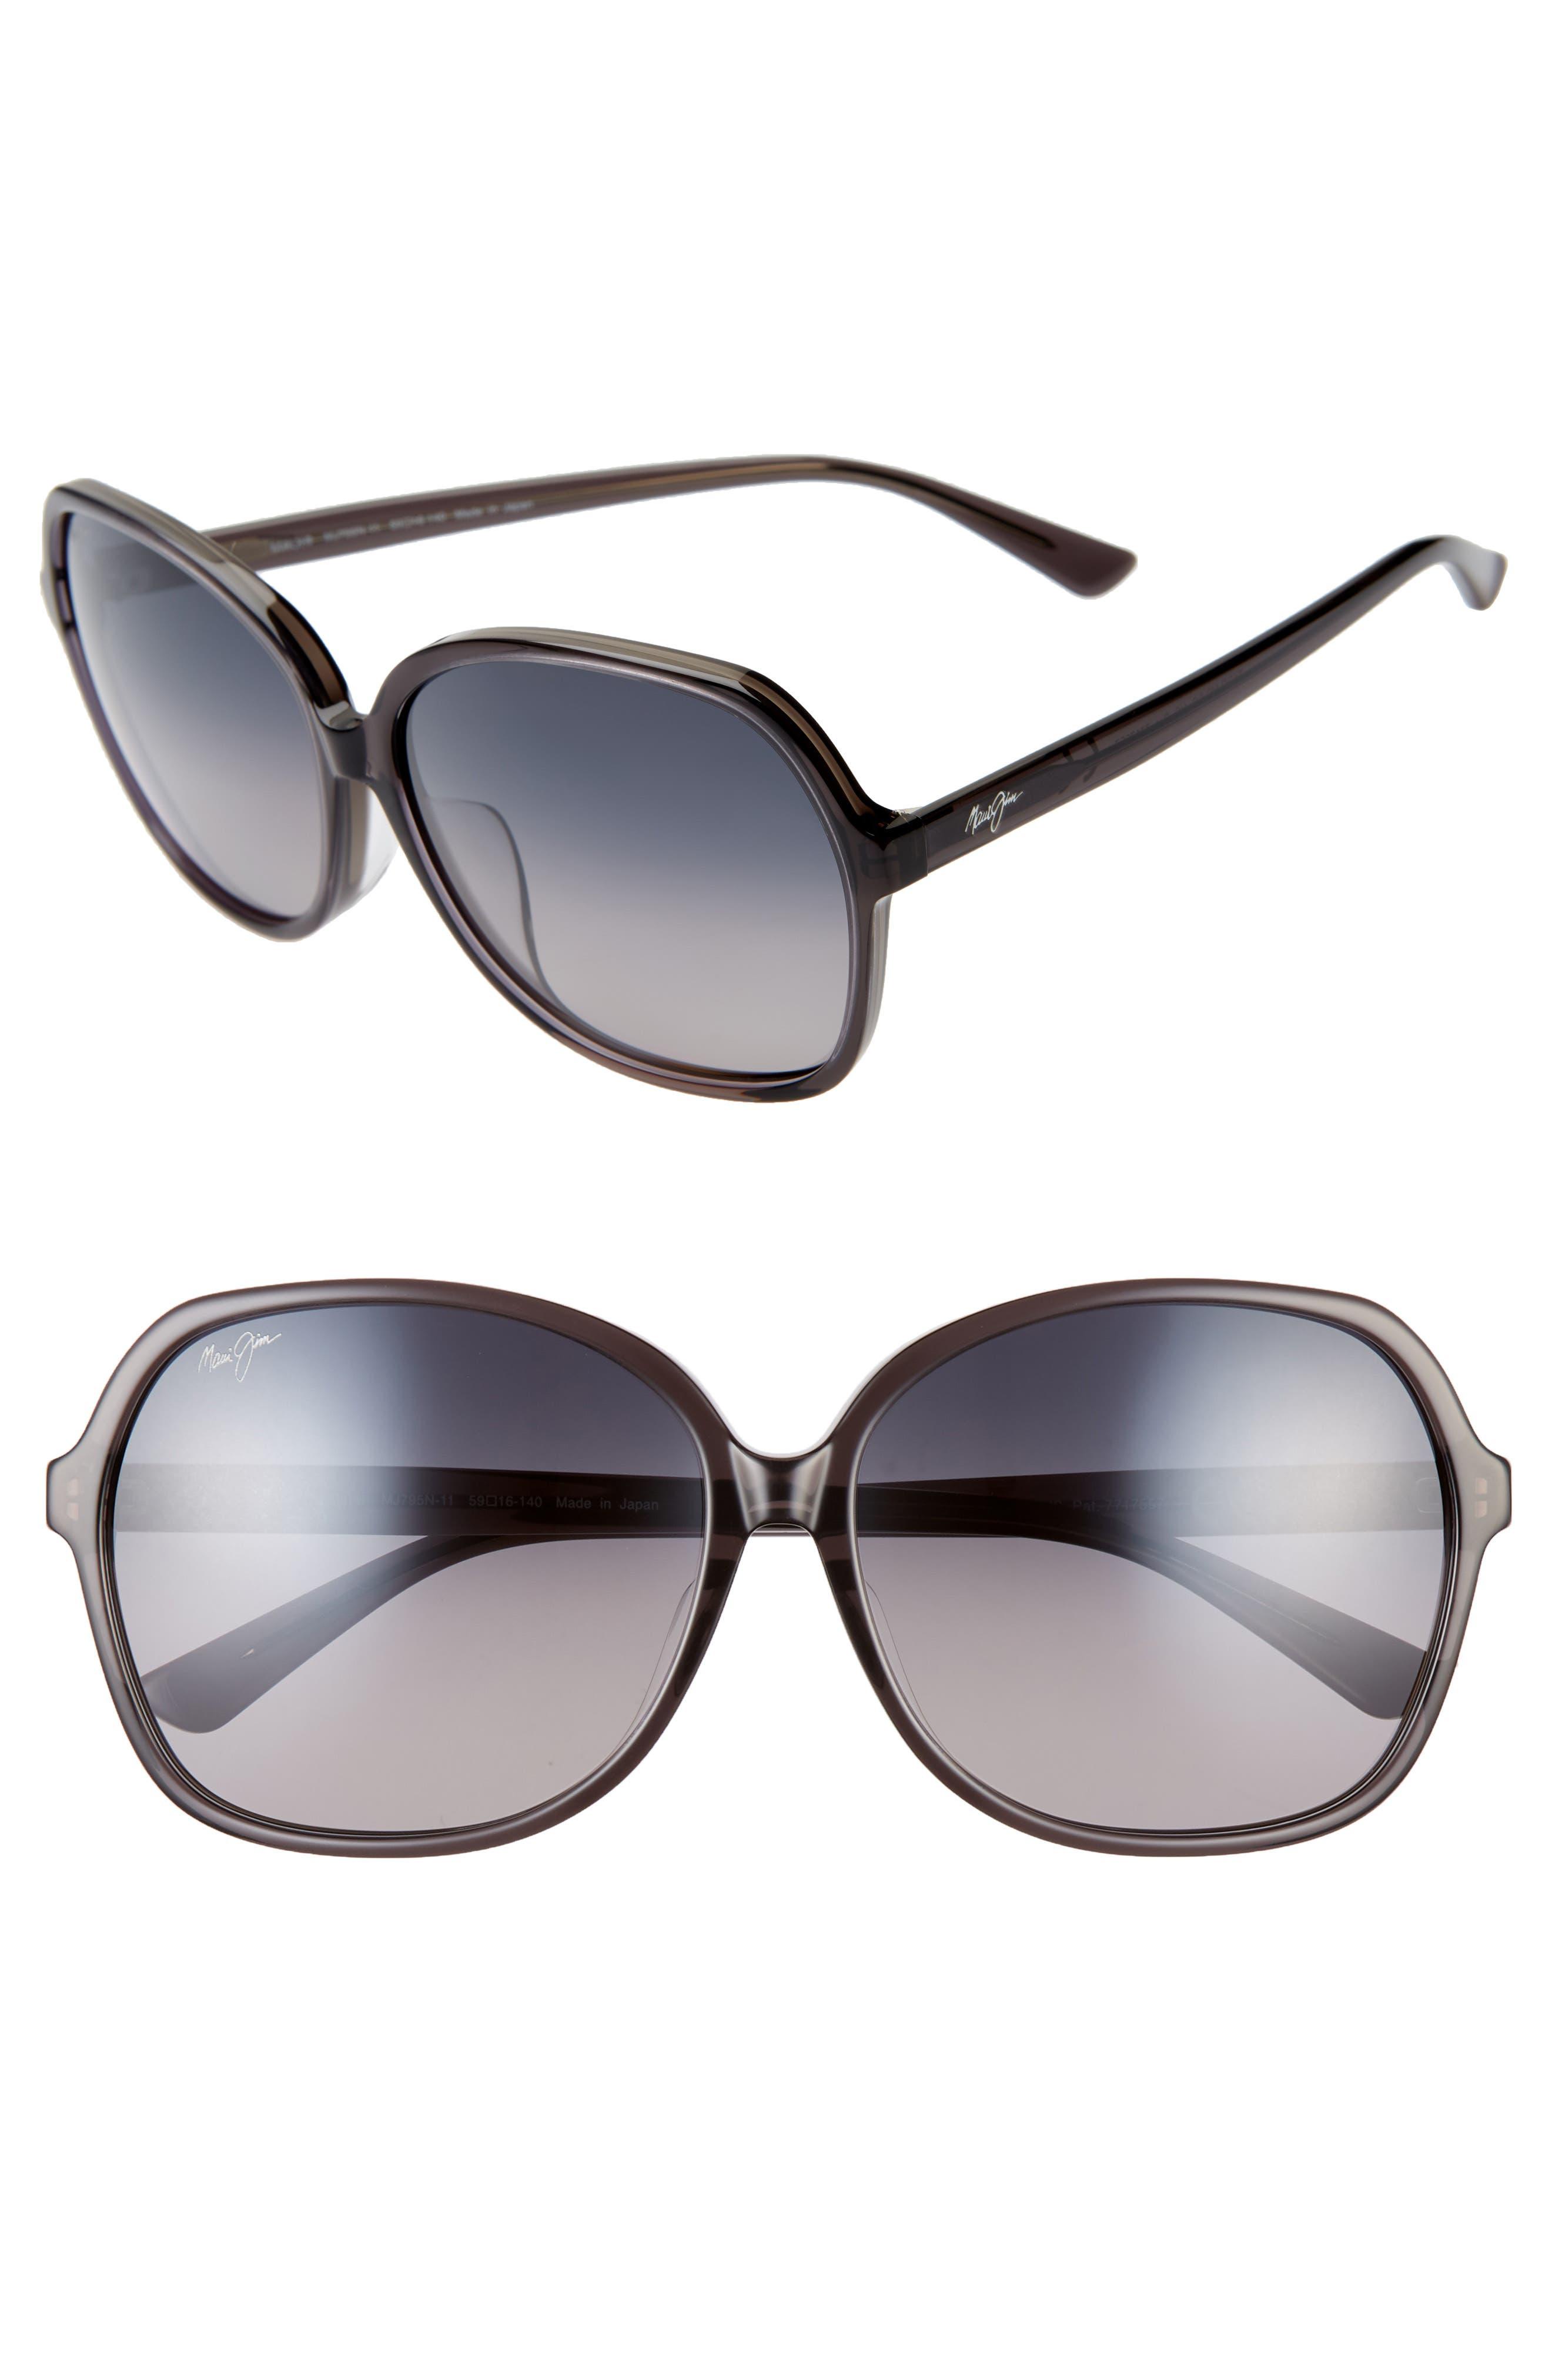 37377371b52b Maui Jim Taro 5m Polarizedplus2 Round Sunglasses - Translucent Grey/ Neutral  Grey